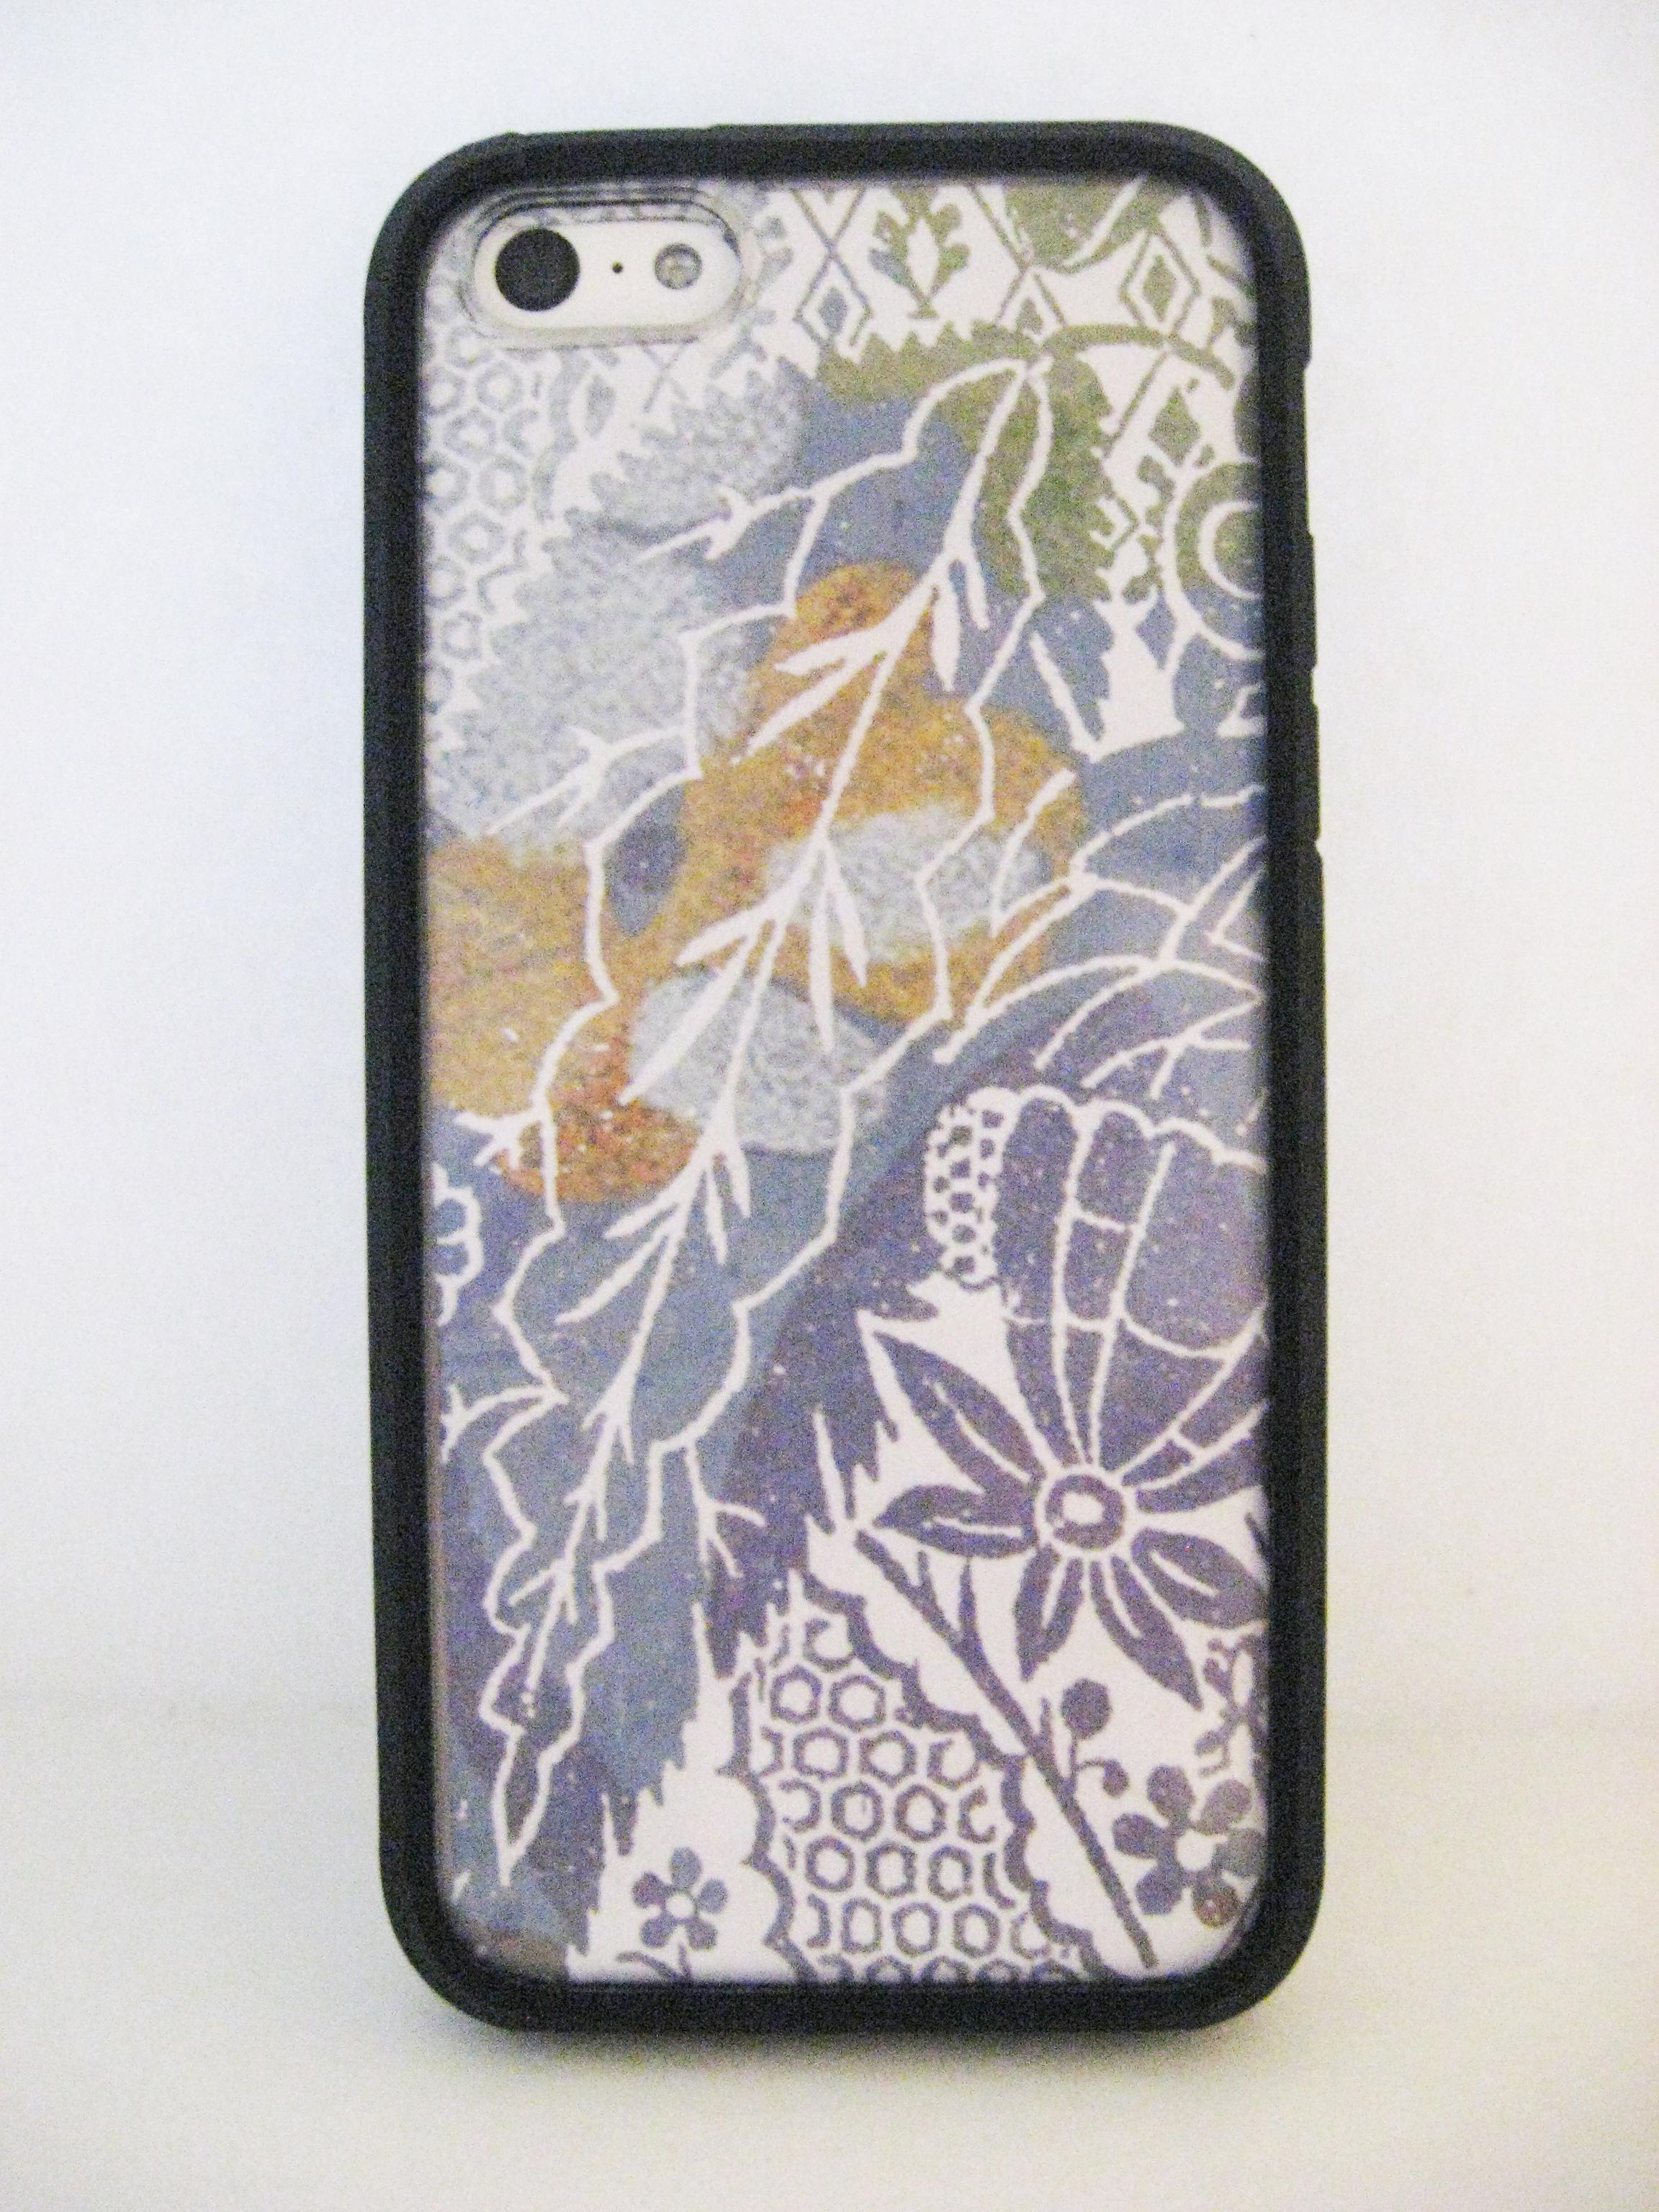 Diy iphone case design make something mondays for Case design